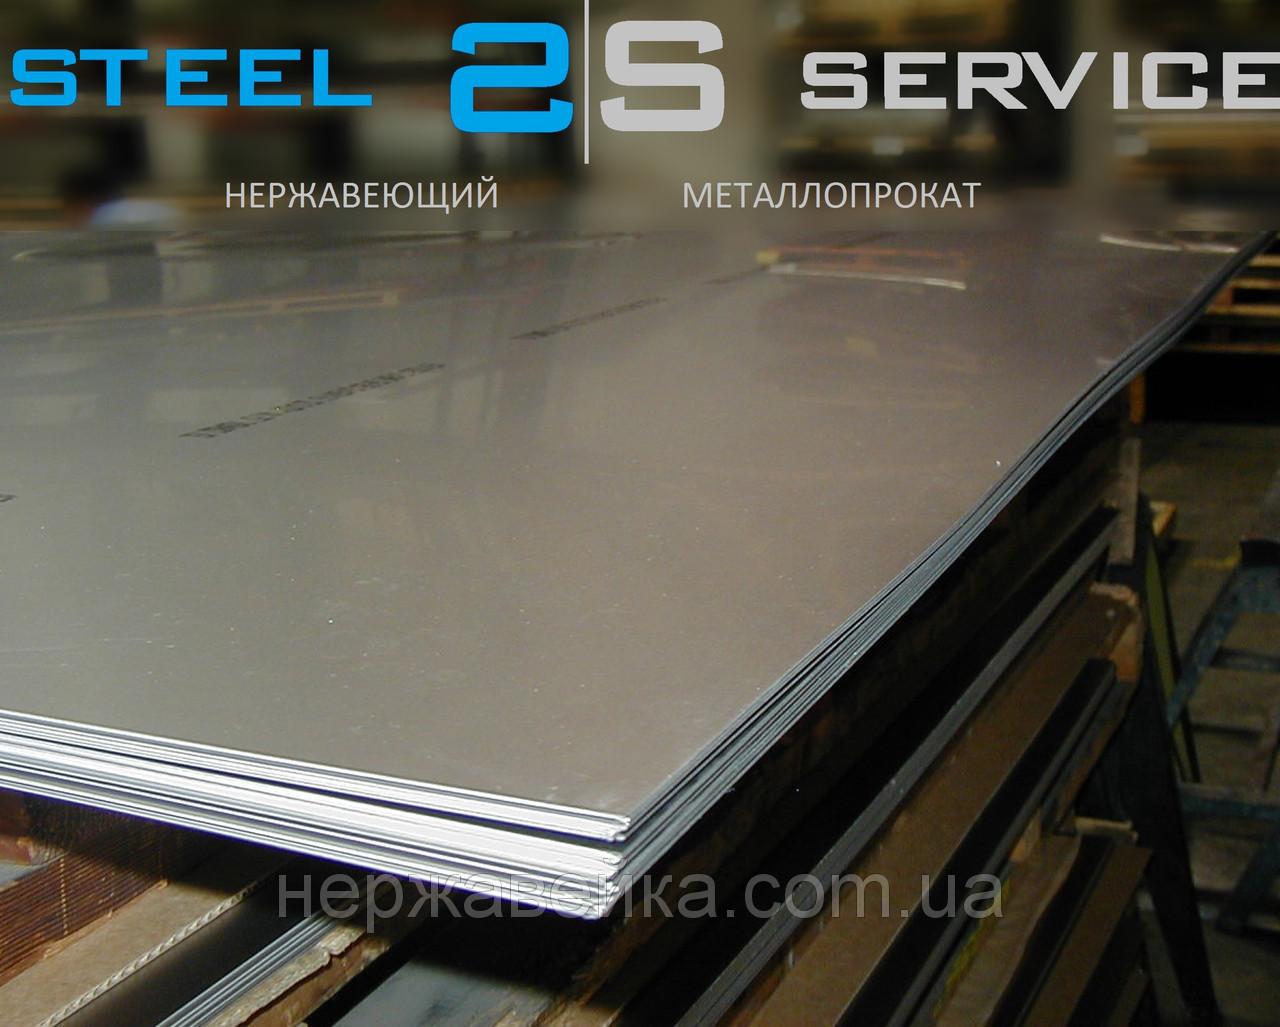 Нержавейка лист 20х1000х2000мм AISI 316Ti(10Х17Н13М2Т) F1 - горячекатанный,  кислотостойкий